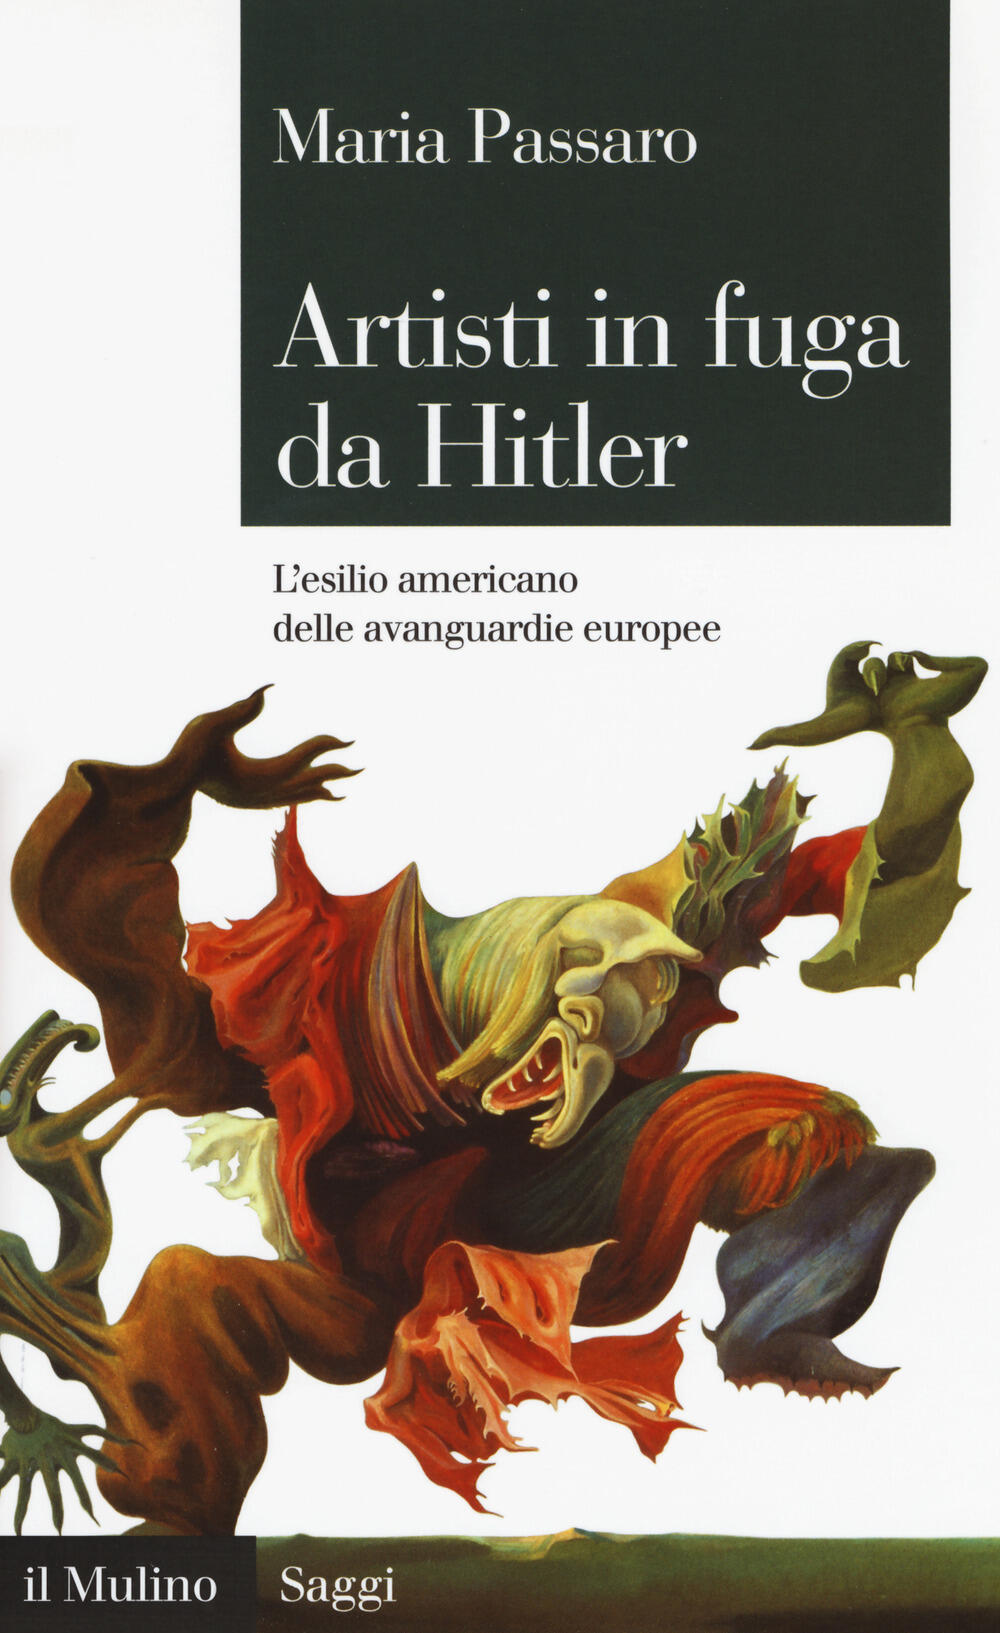 L'arte che spaventava Hitler. Artisti in fuga da Hitler.